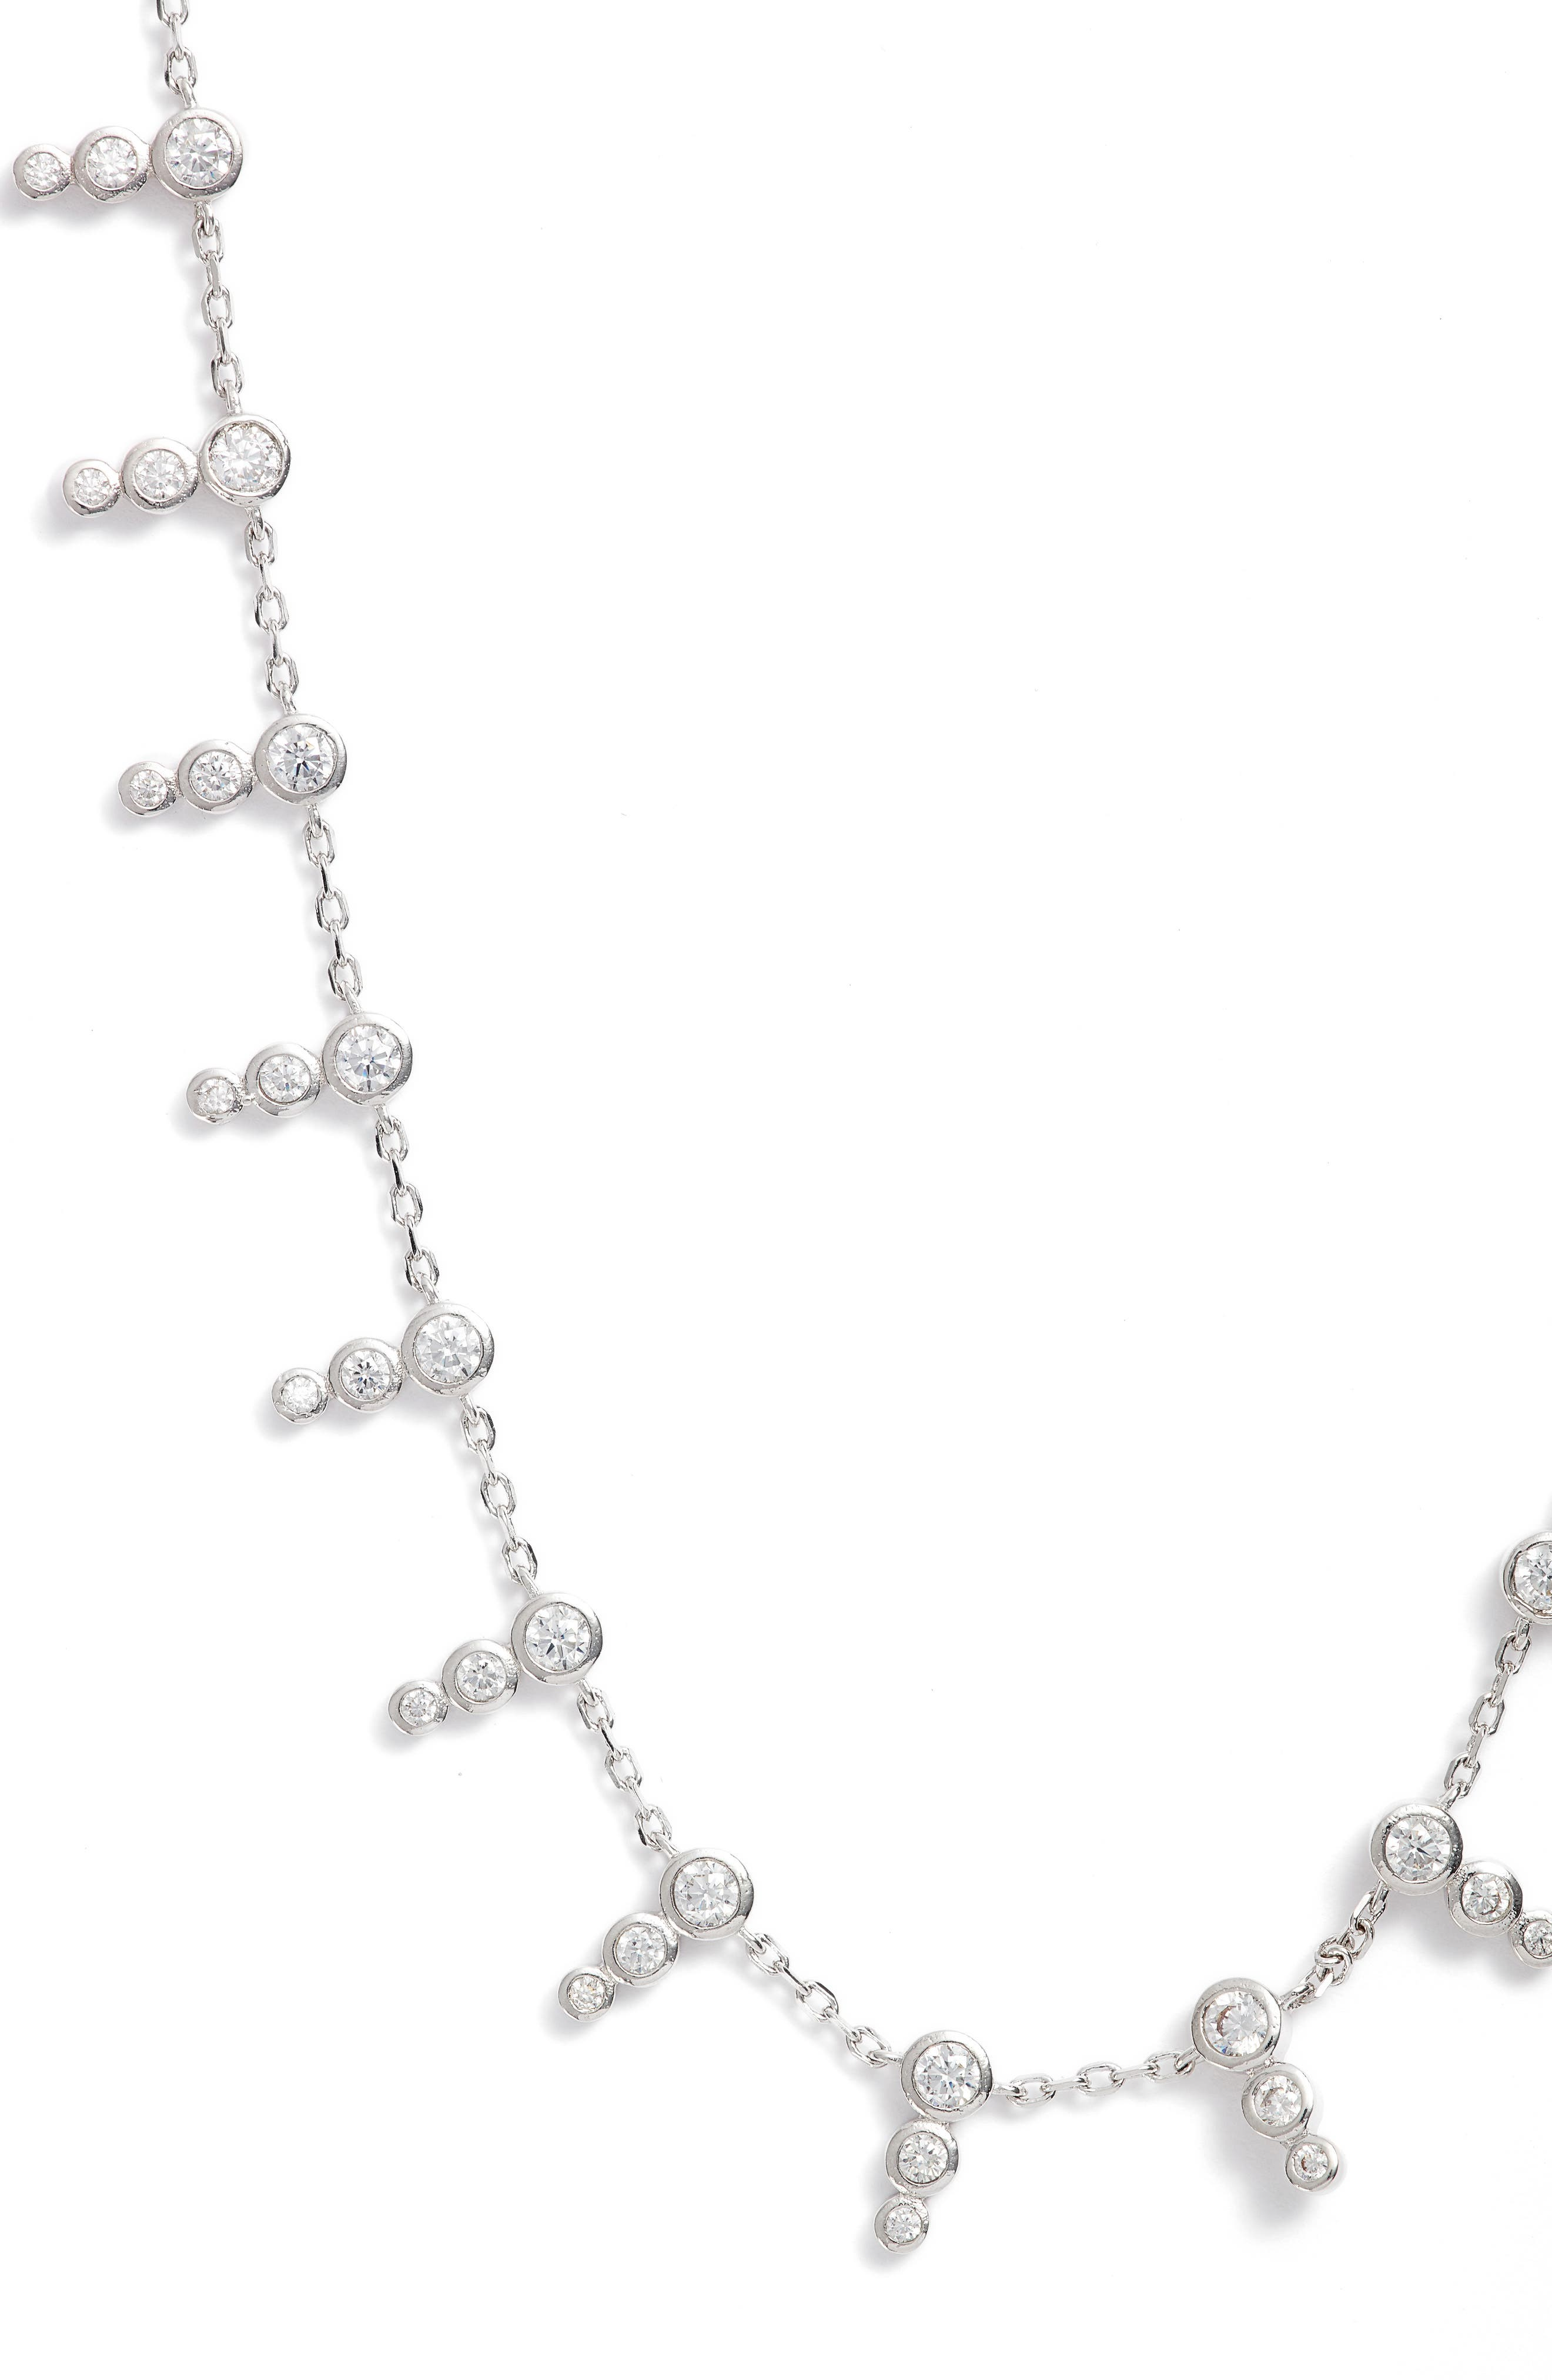 McPhee Cubic Zirconia Collar Necklace,                             Main thumbnail 1, color,                             041